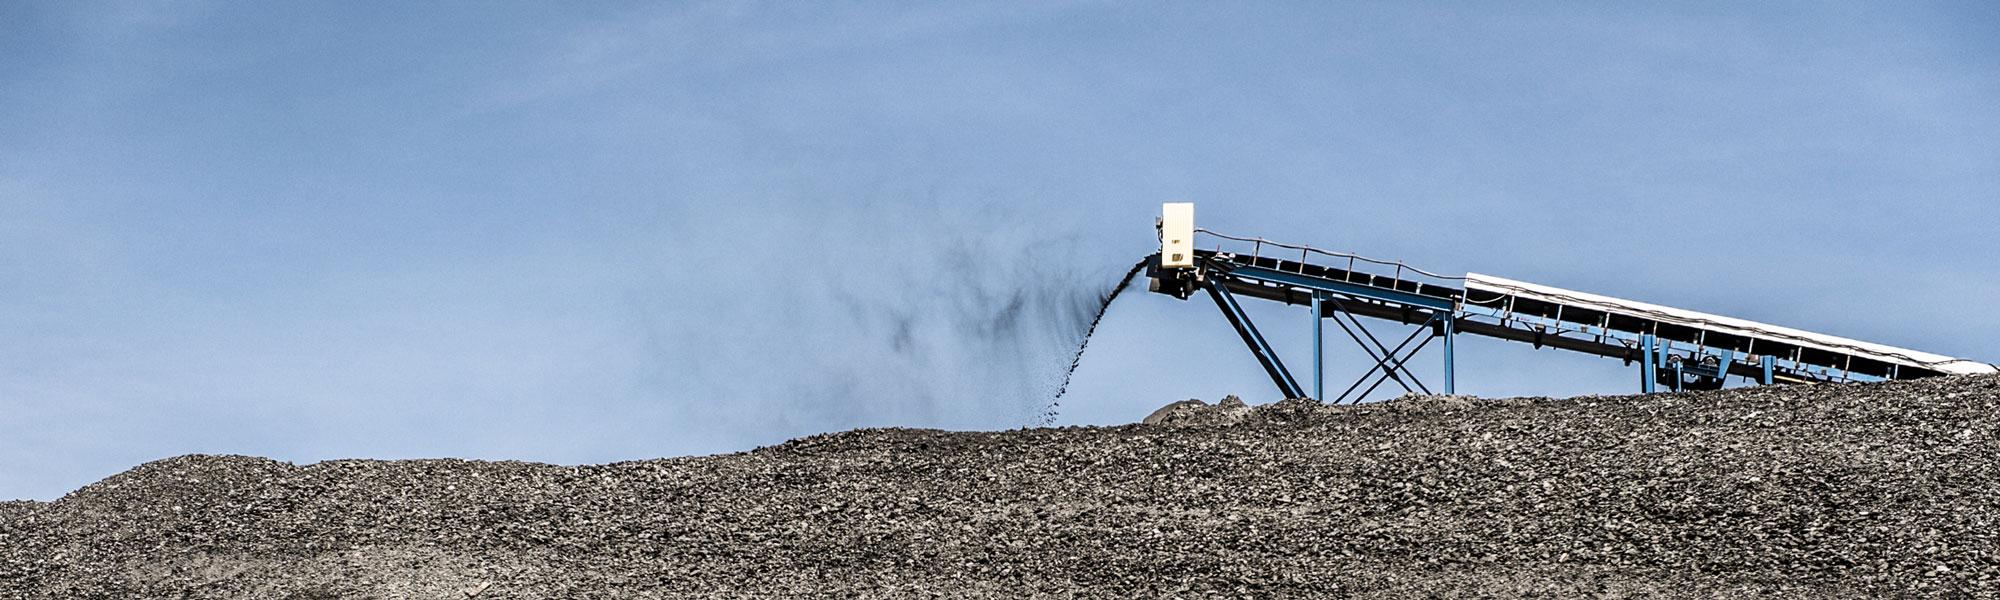 Machinery Processing Material At Job Site